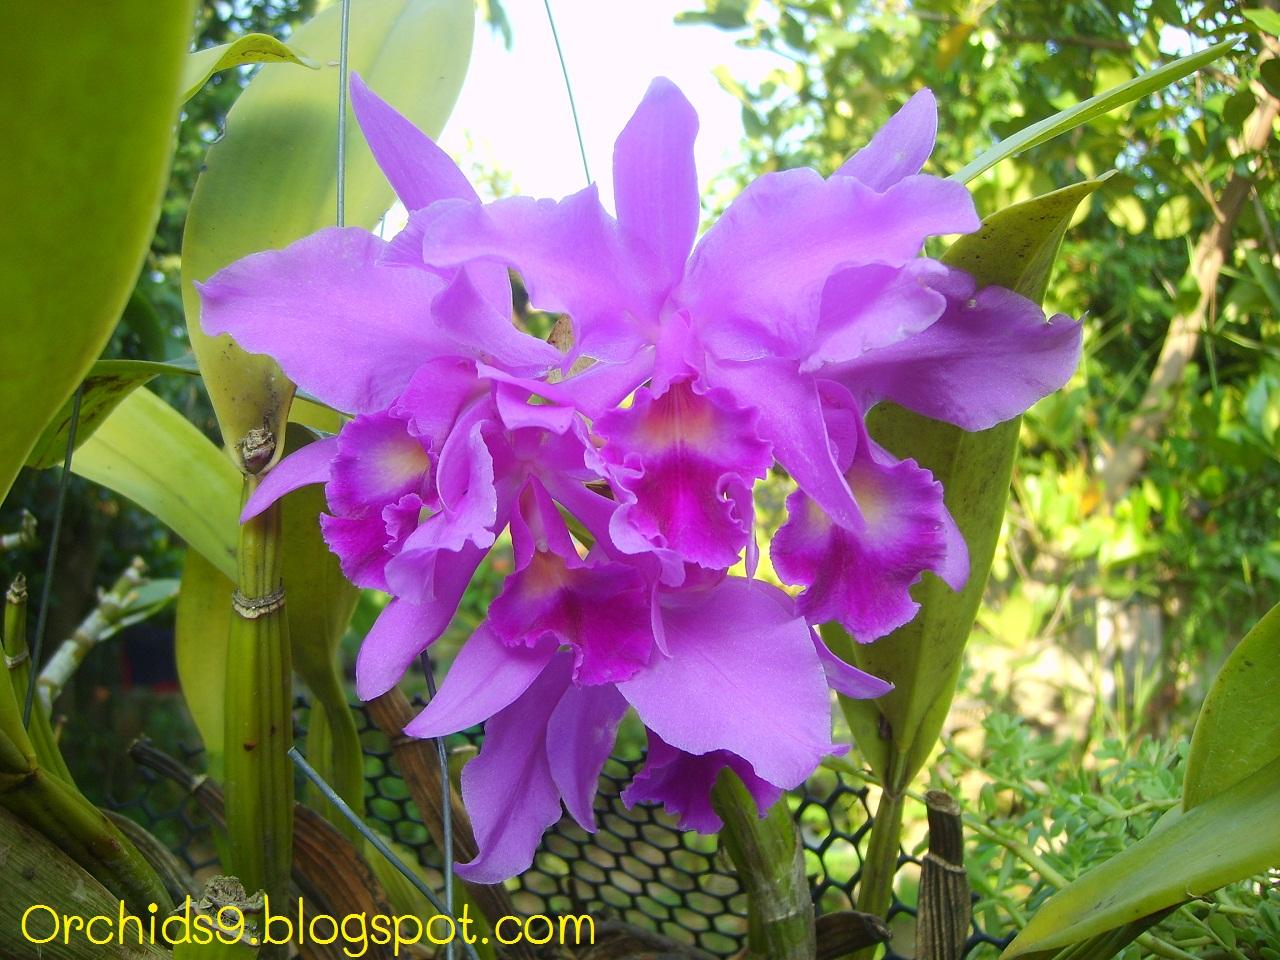 Blue Orchid Flower Blue Orchid Flowers Nature Flower